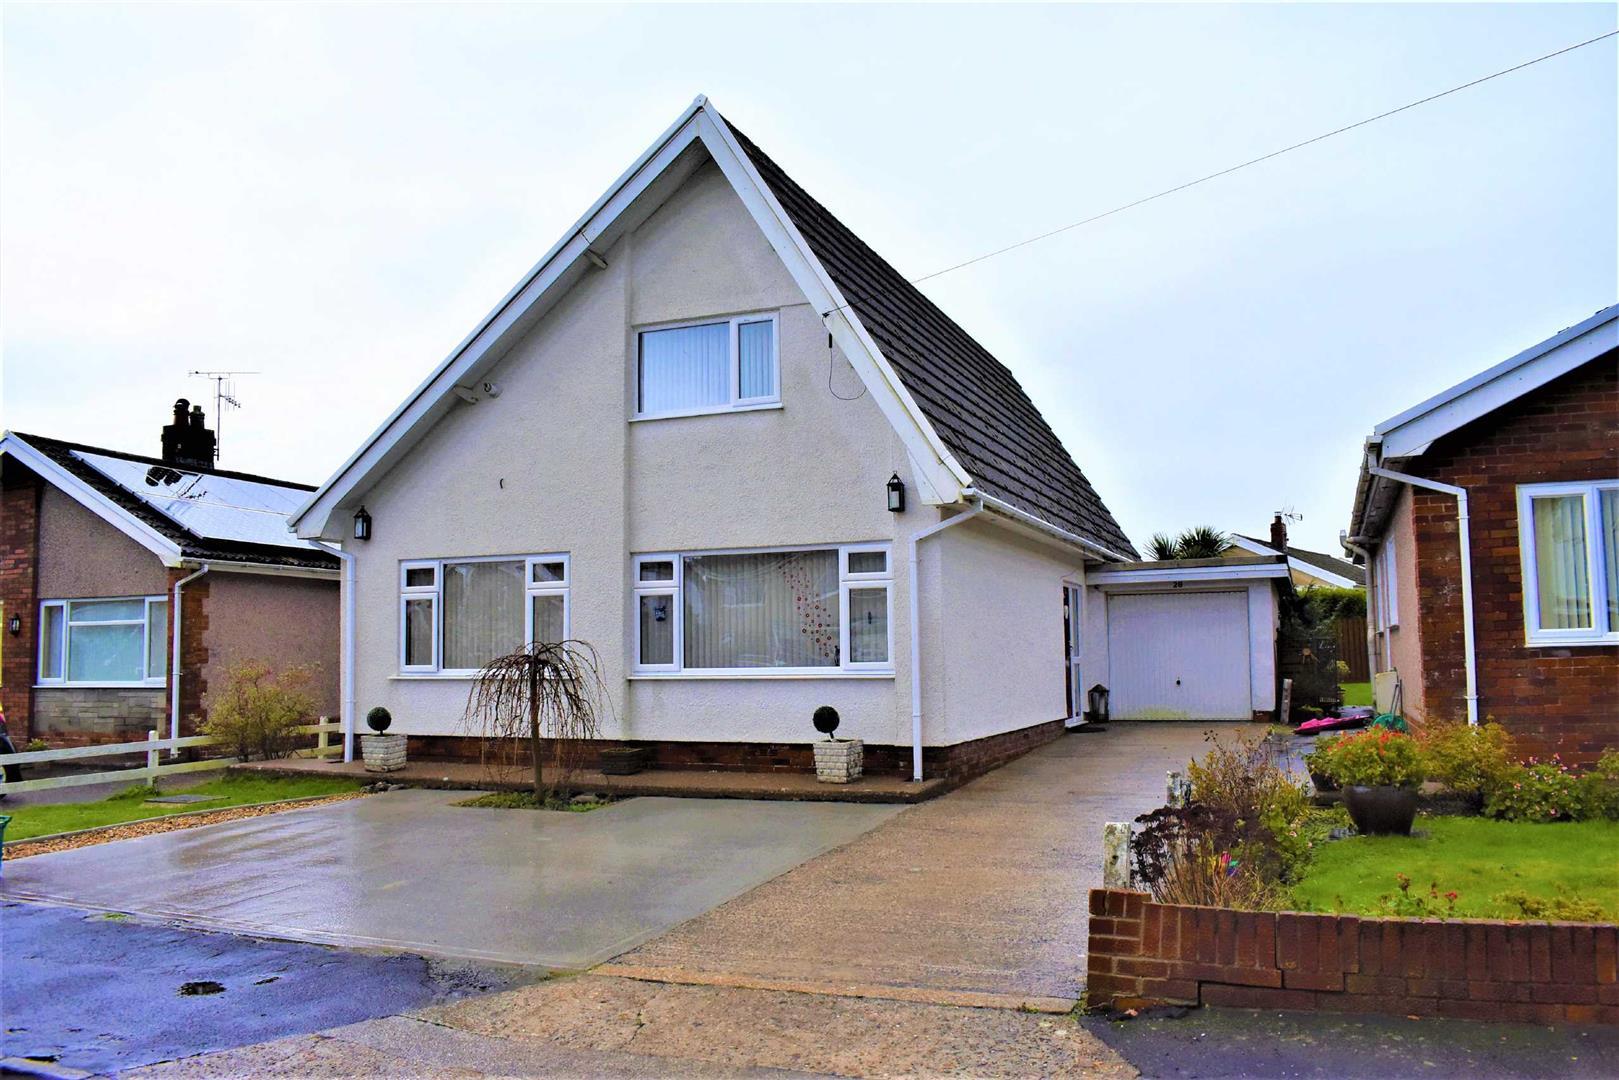 Westland Avenue, West Cross, Swansea, SA3 5NR